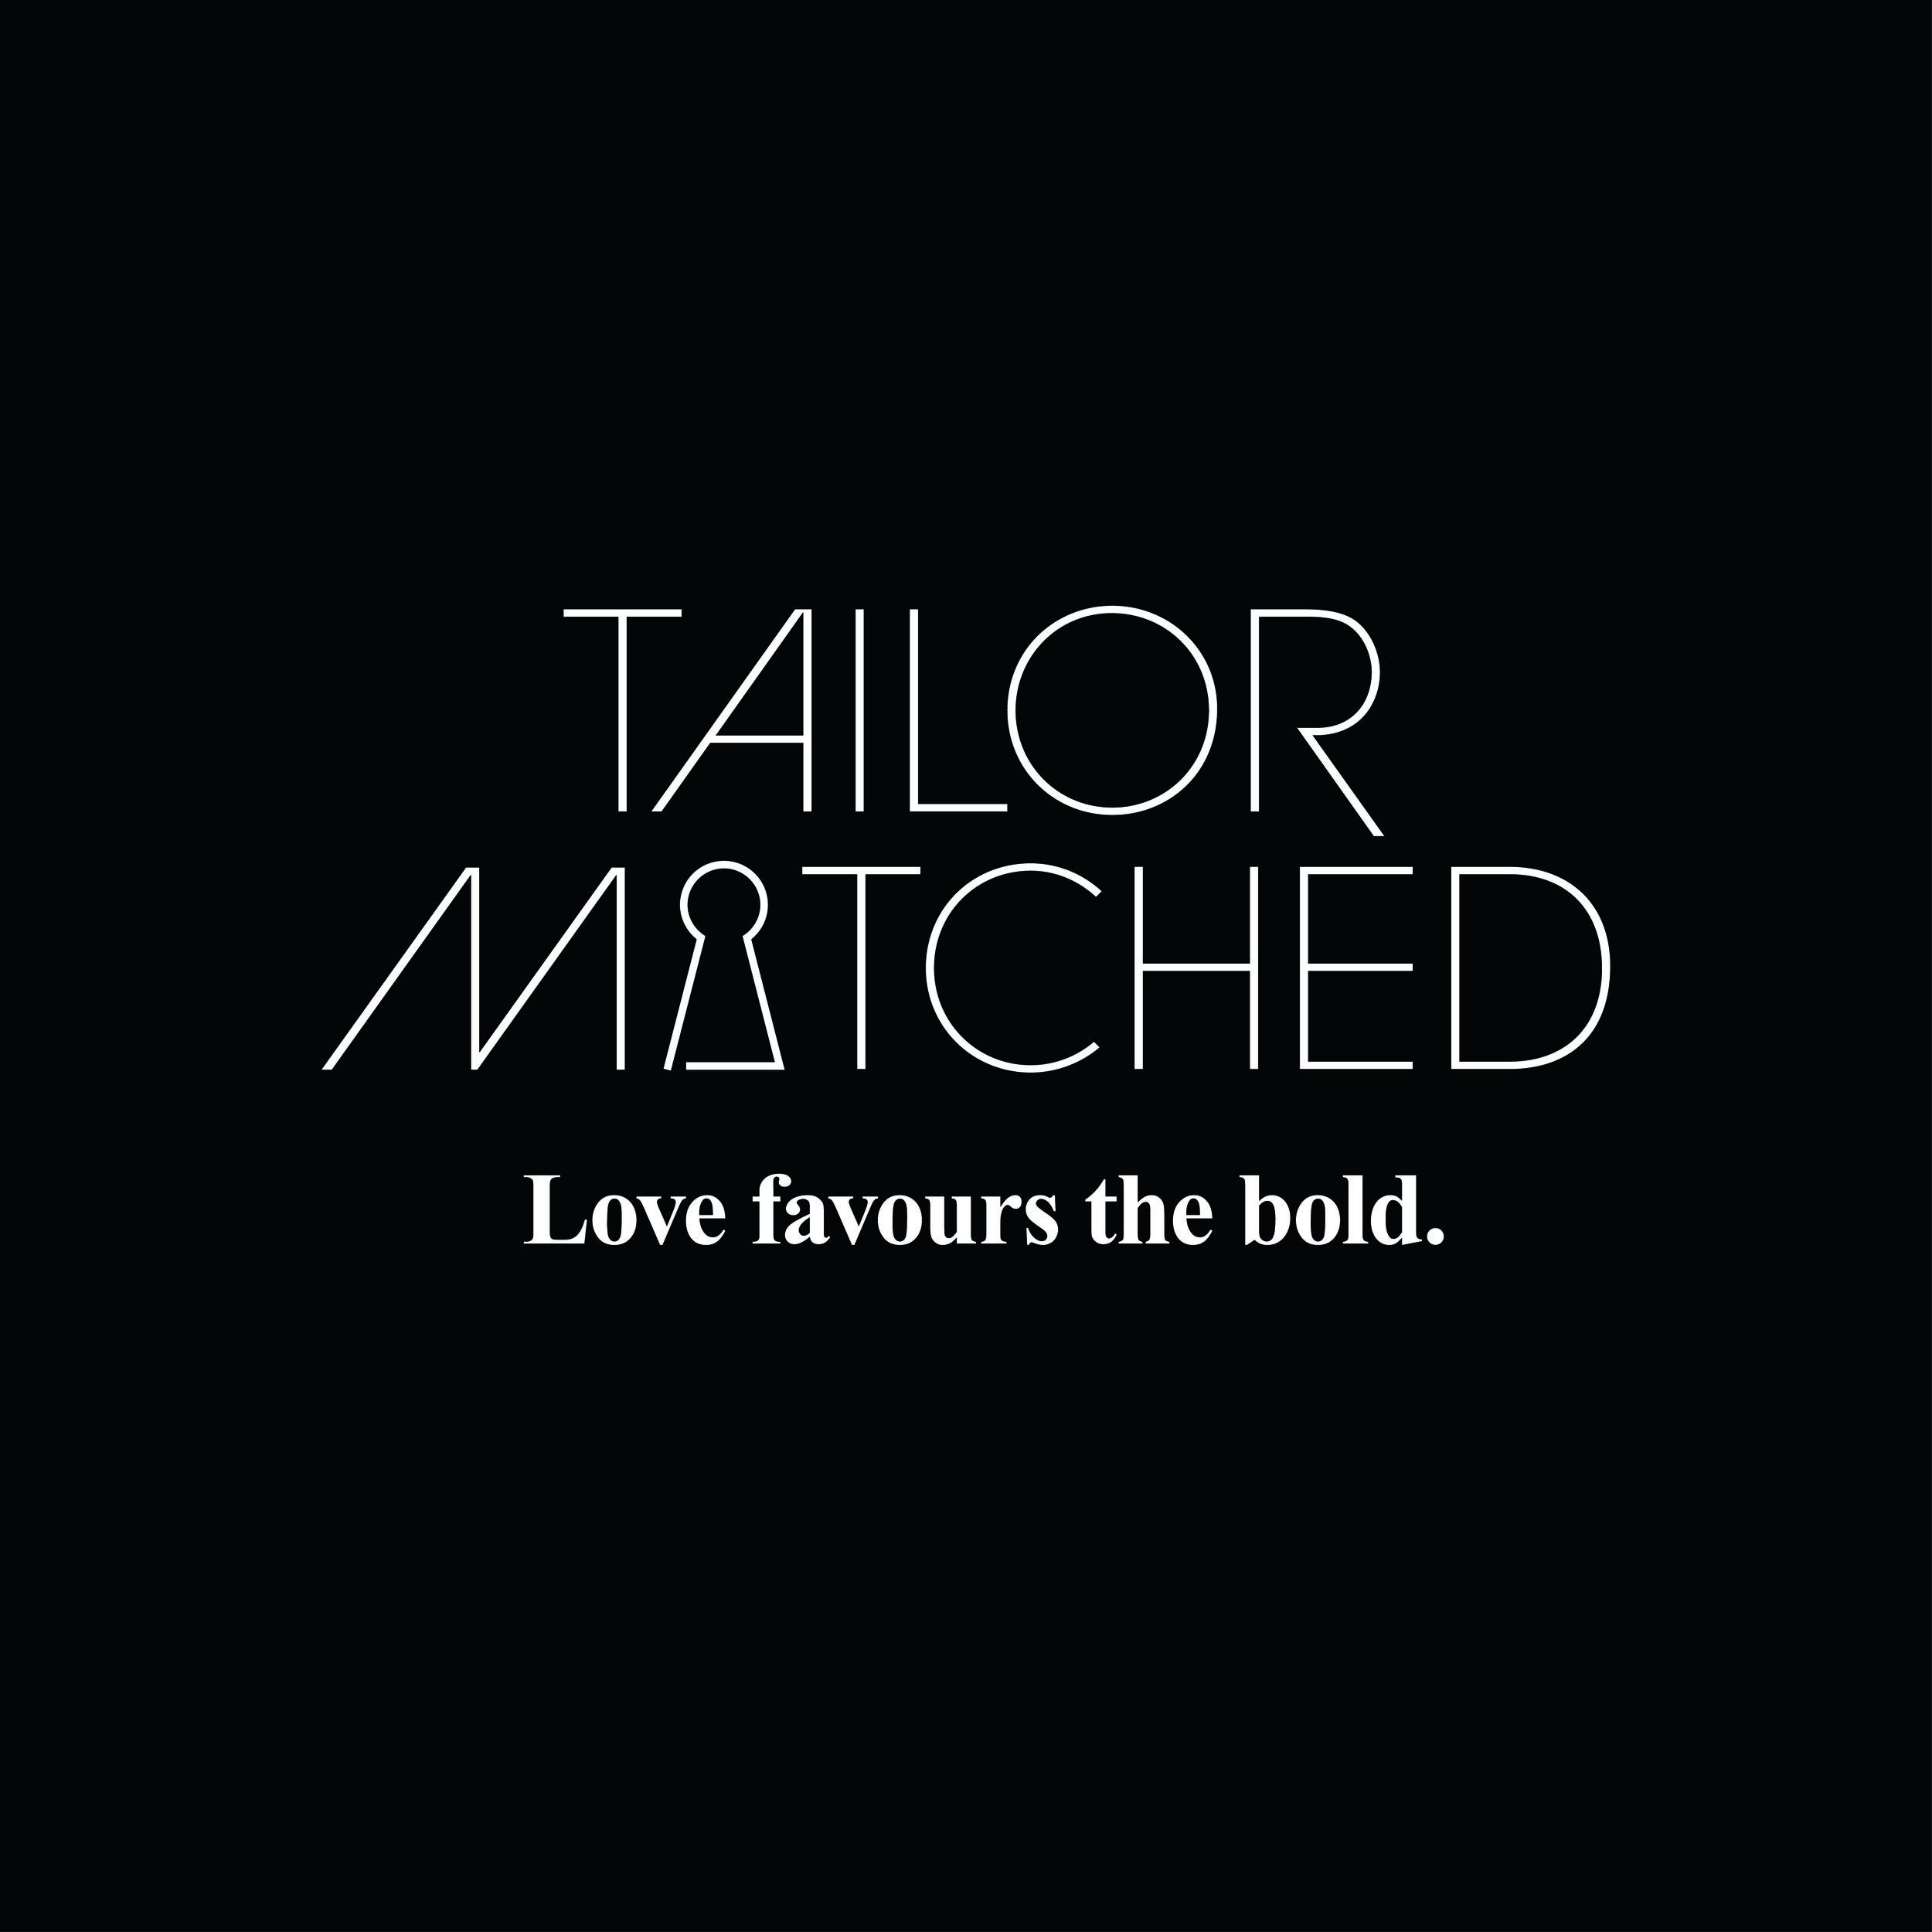 tailormatched-logo-black-square-claim-CMYK (1) (1).jpg